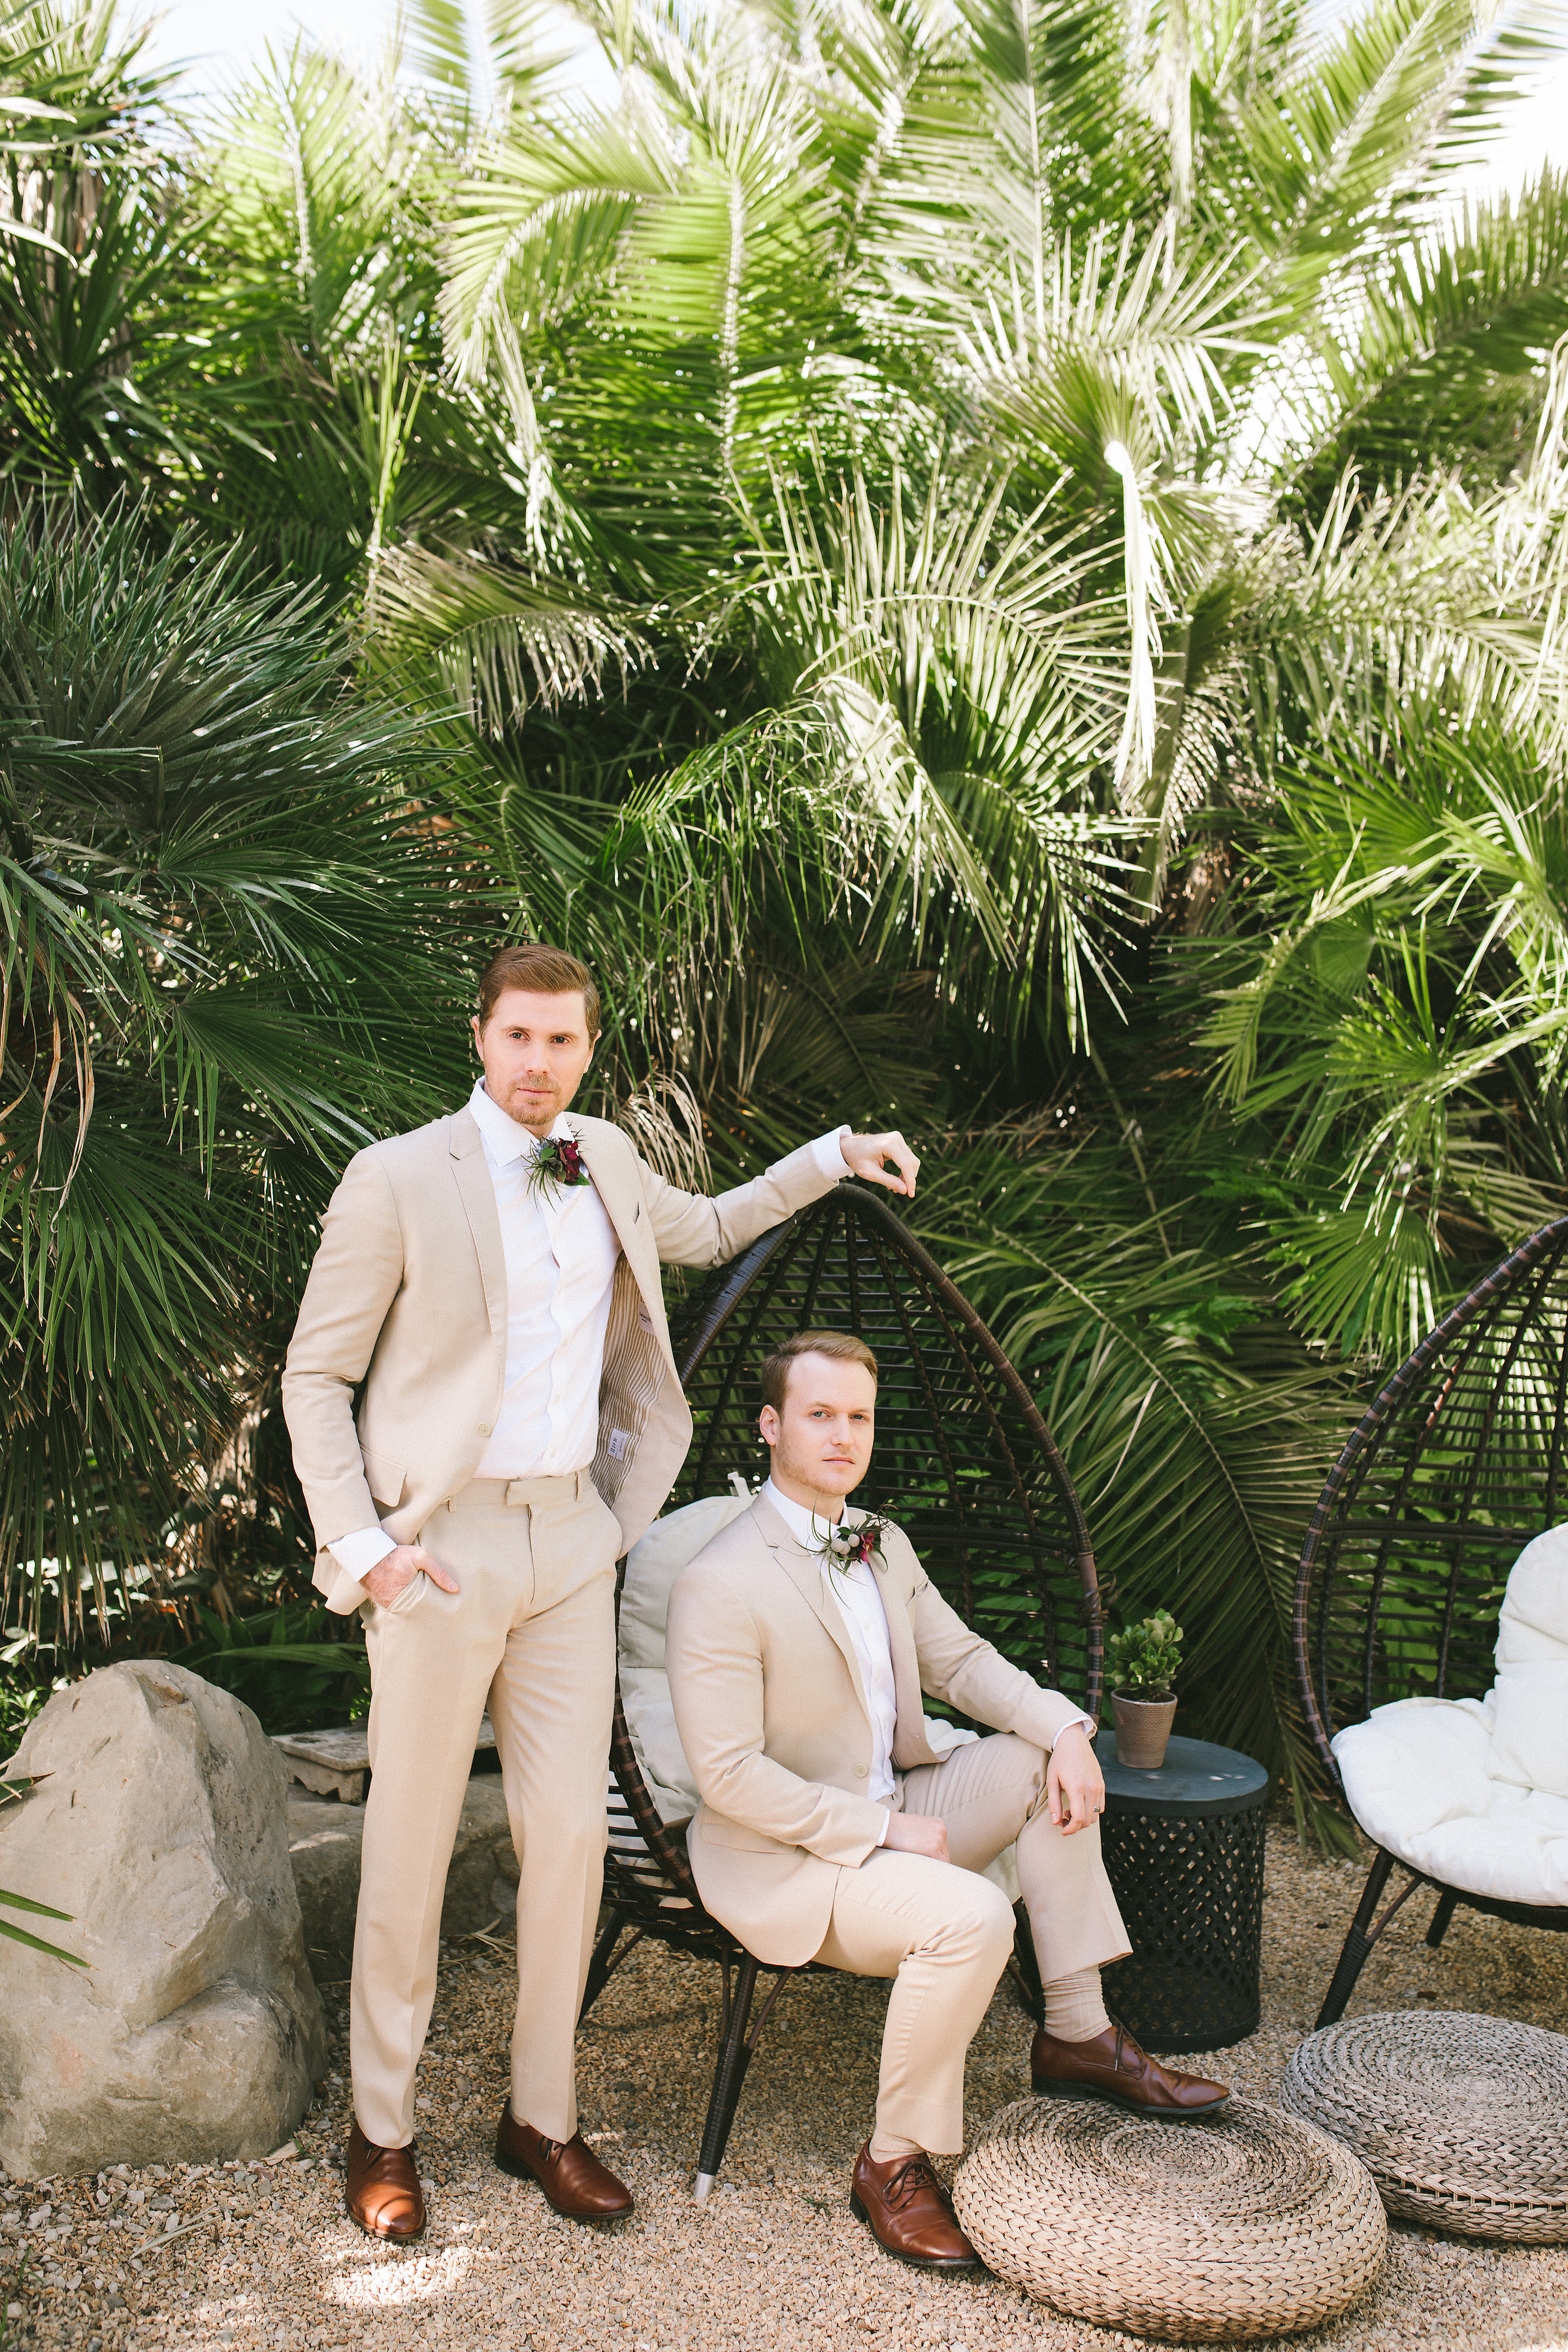 gay wedding in ojai california at caravan outpost.jpg